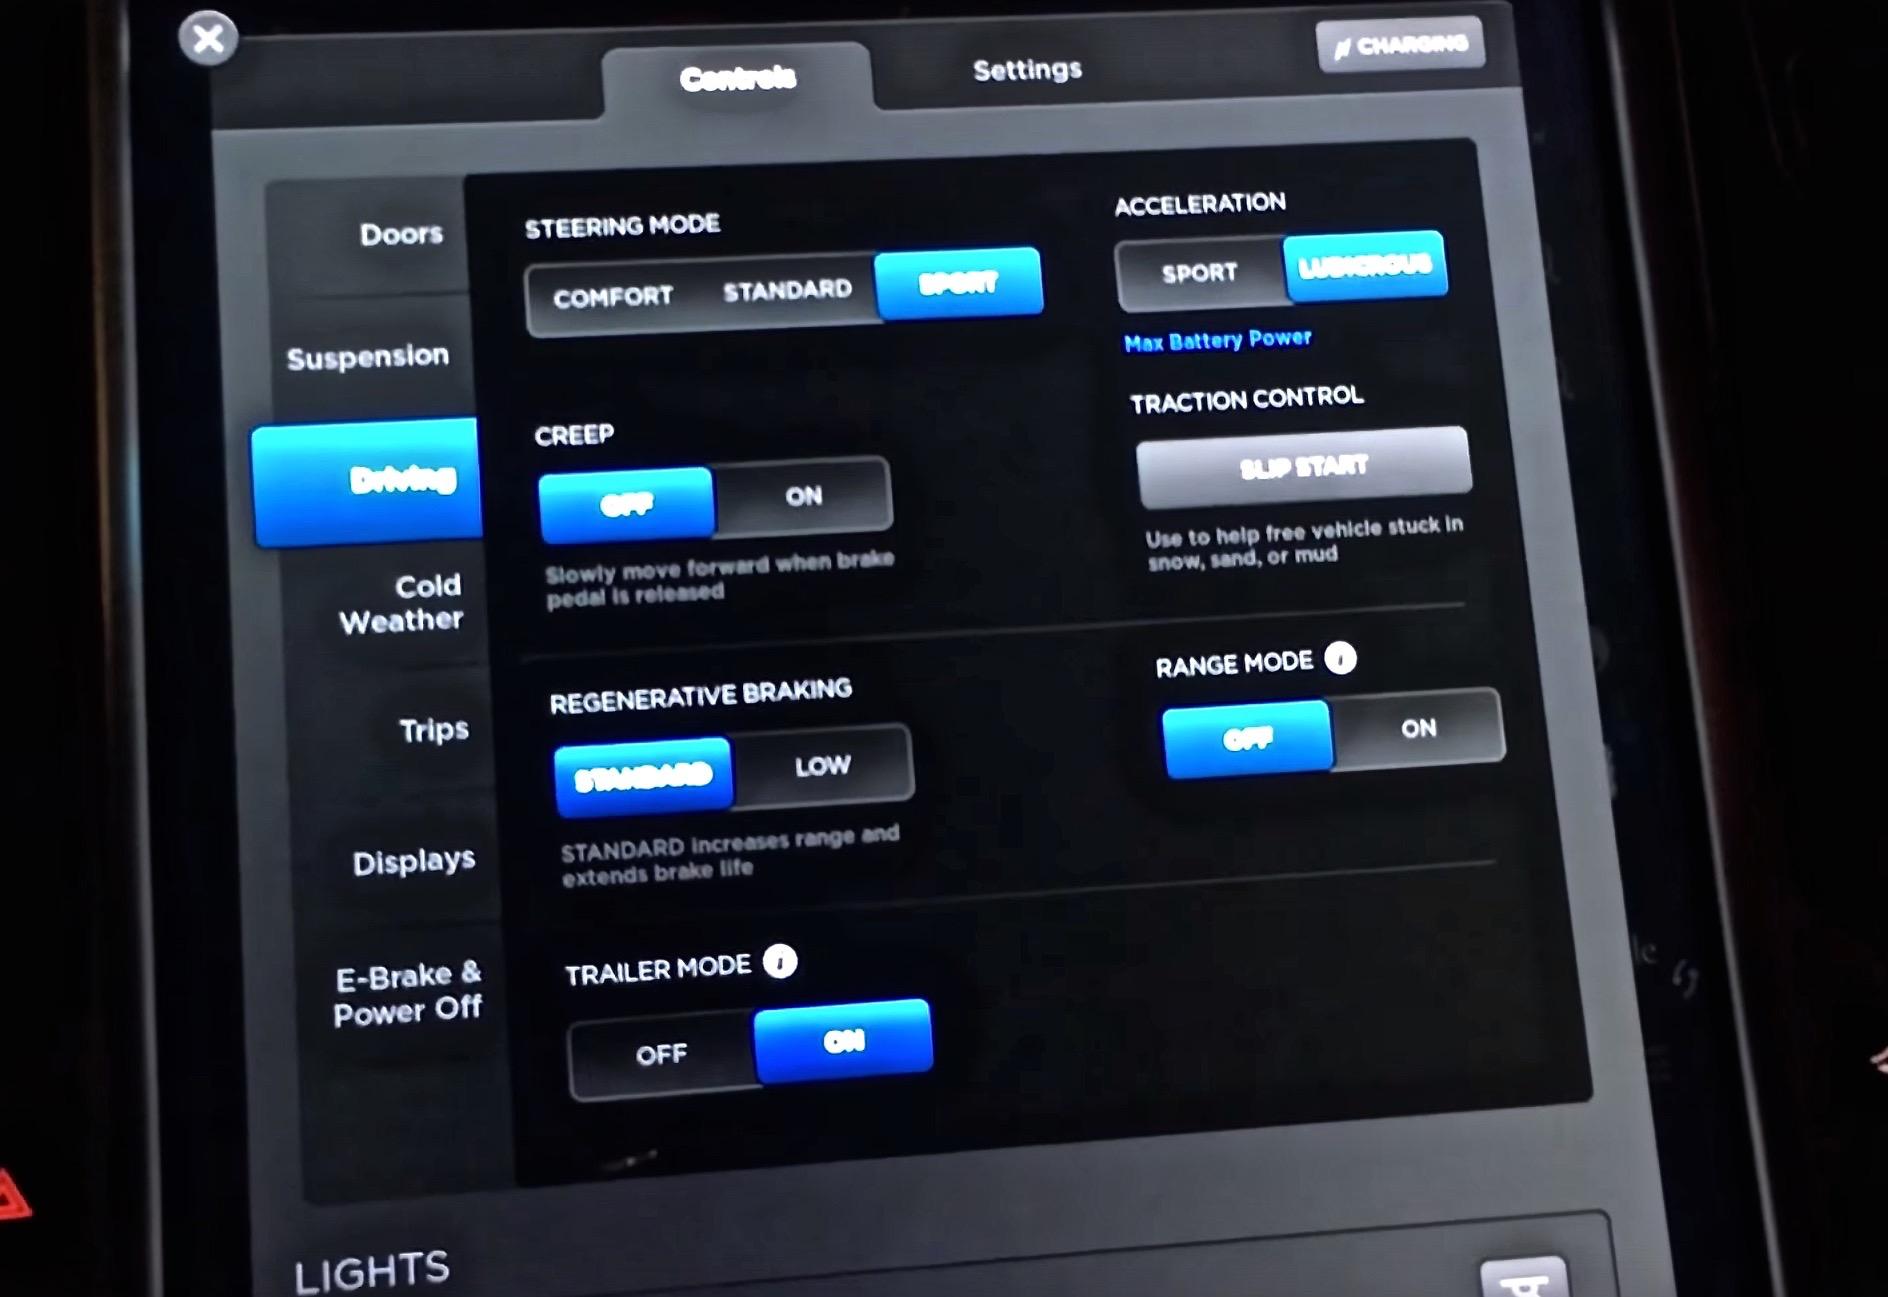 Tesla Model X Firmware 7 0 Features Exposed